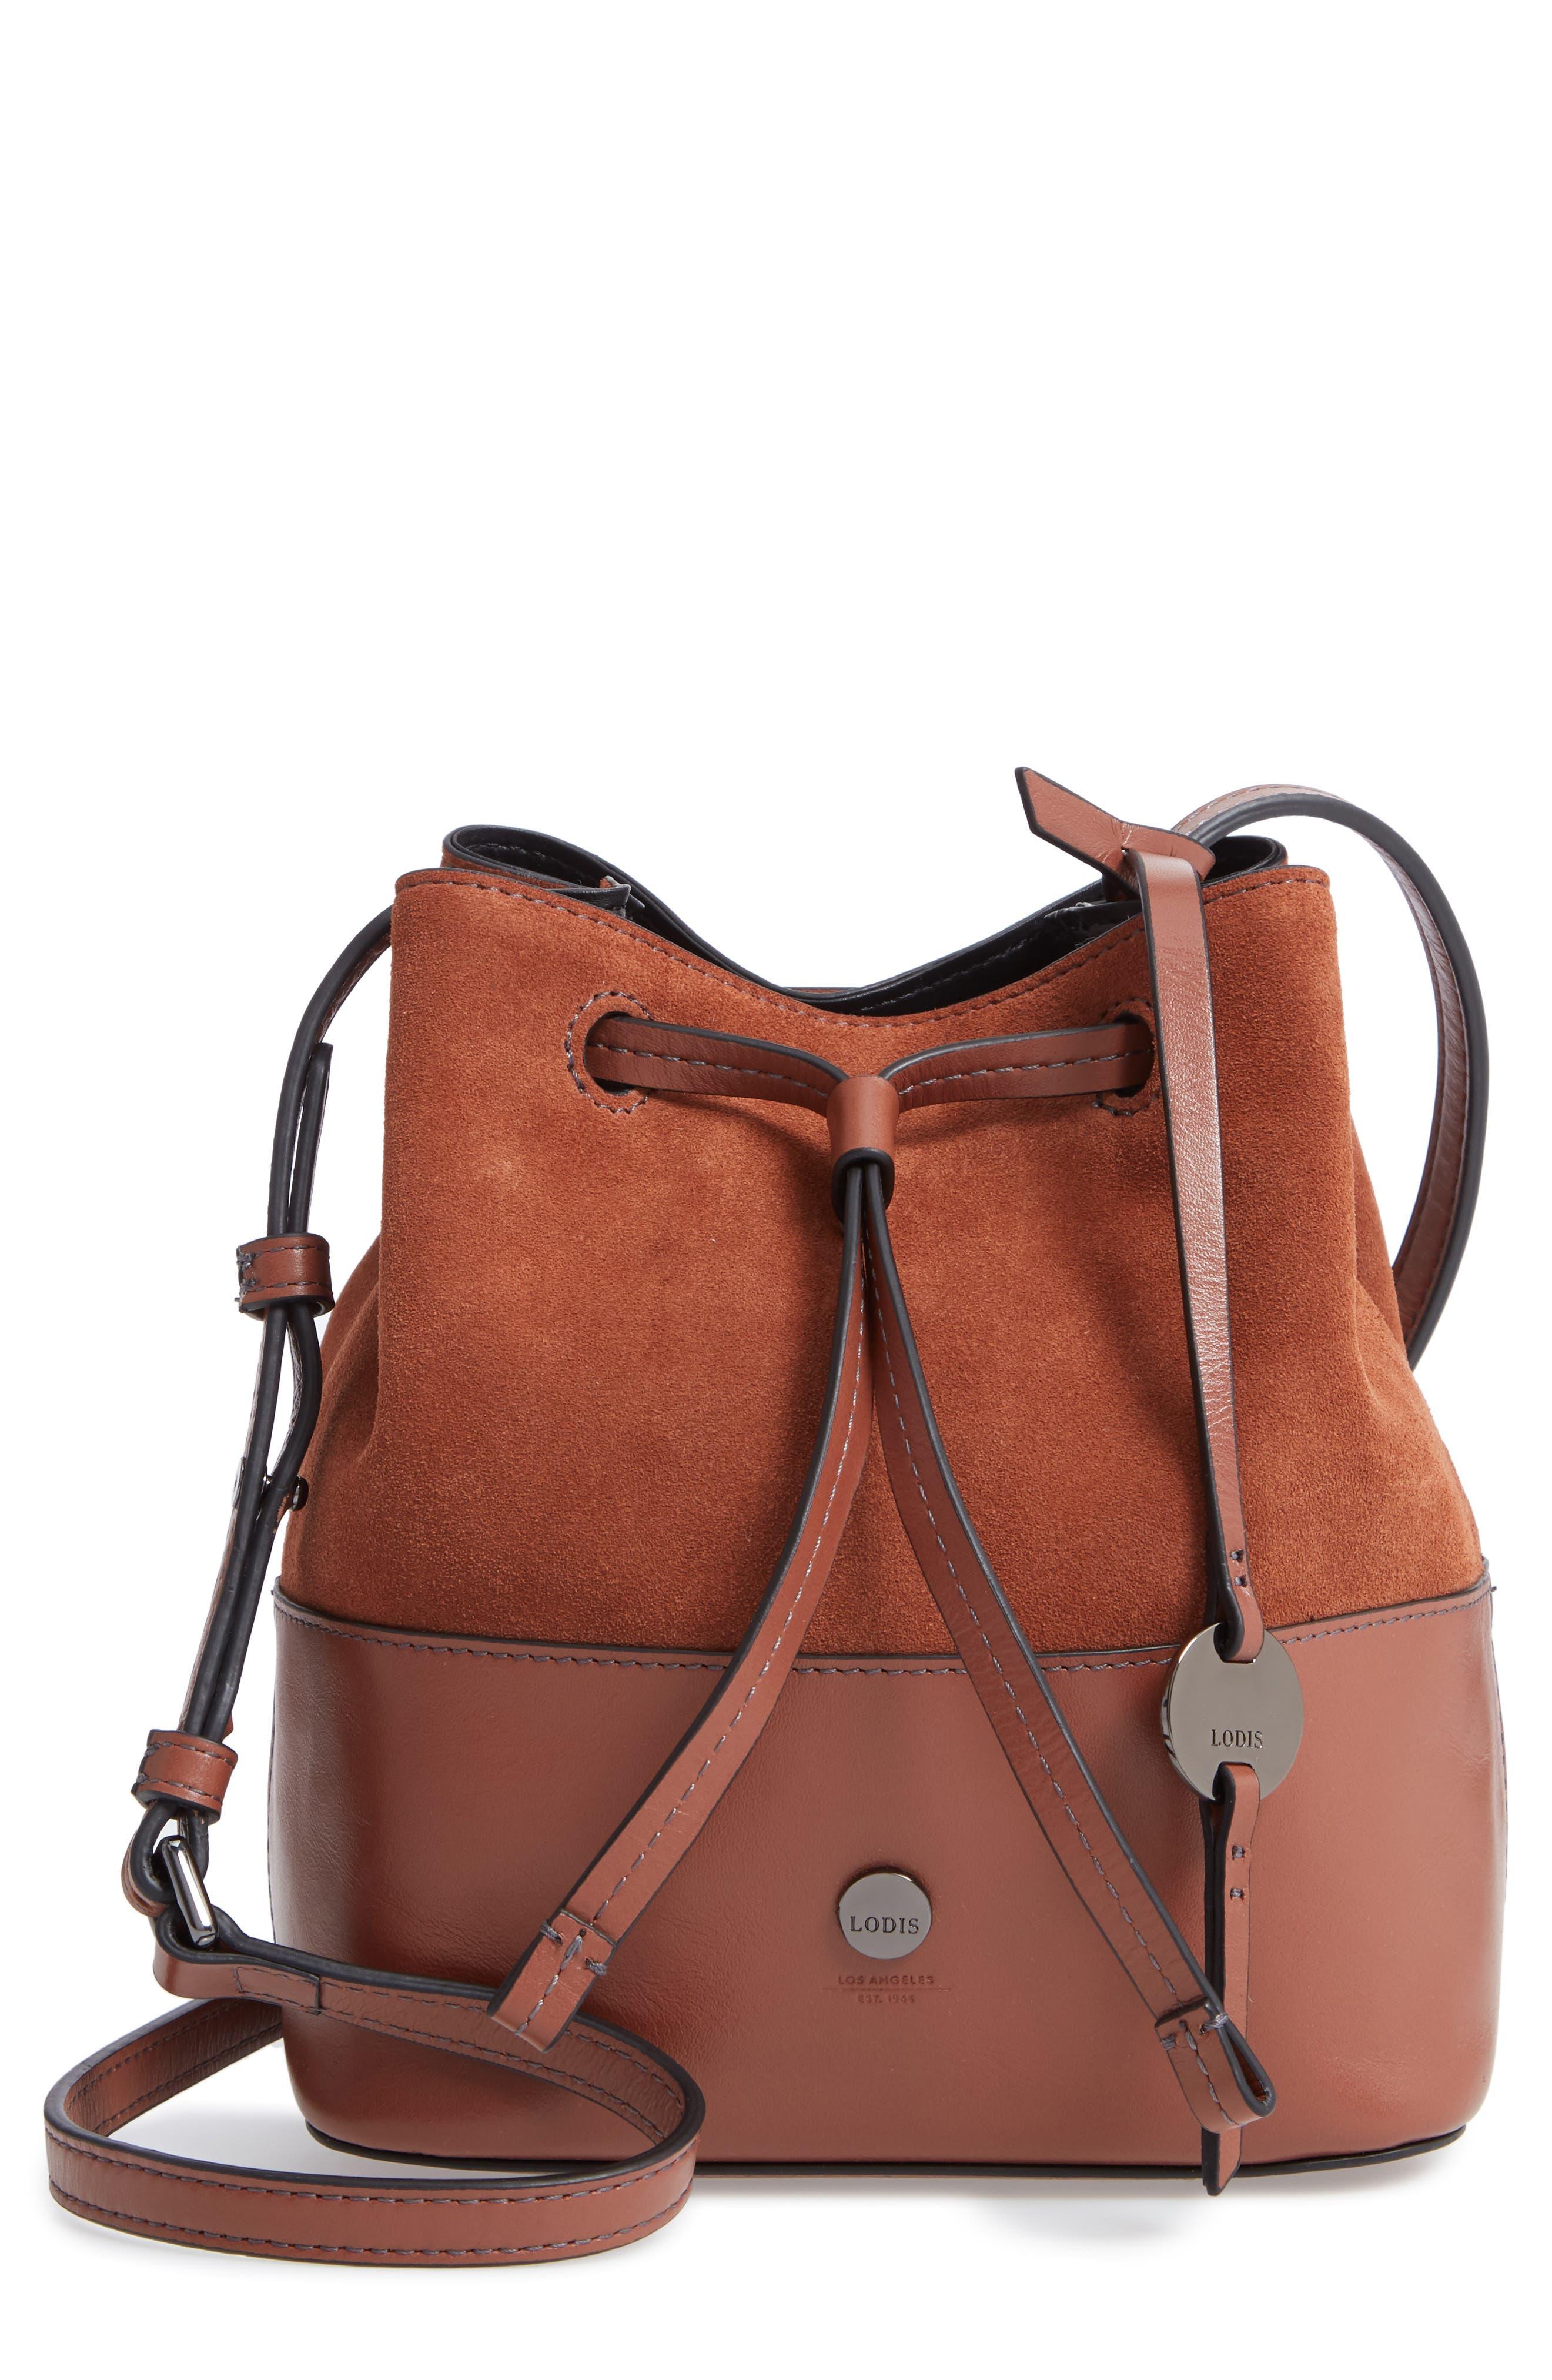 Small Blake RFID Leather Bucket Bag,                             Main thumbnail 1, color,                             SADDLE